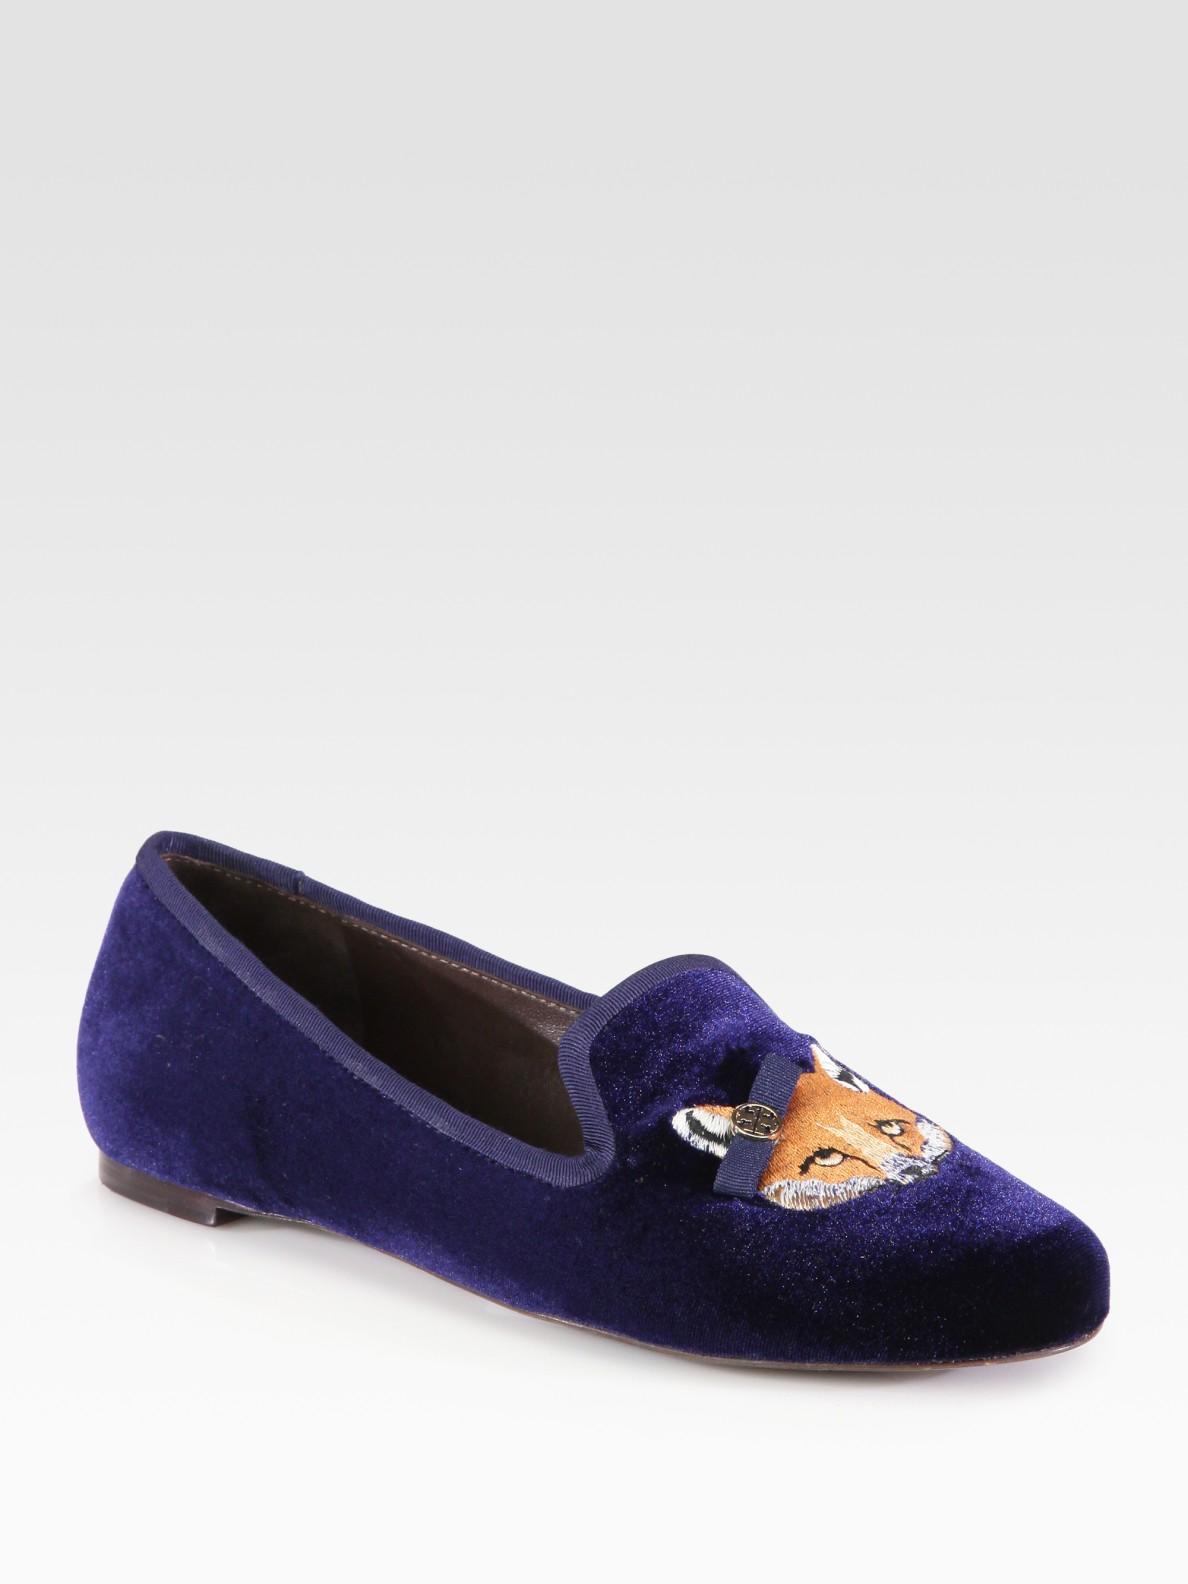 Tory Burch Fox Velvet Smoking Slippers In Blue Lyst